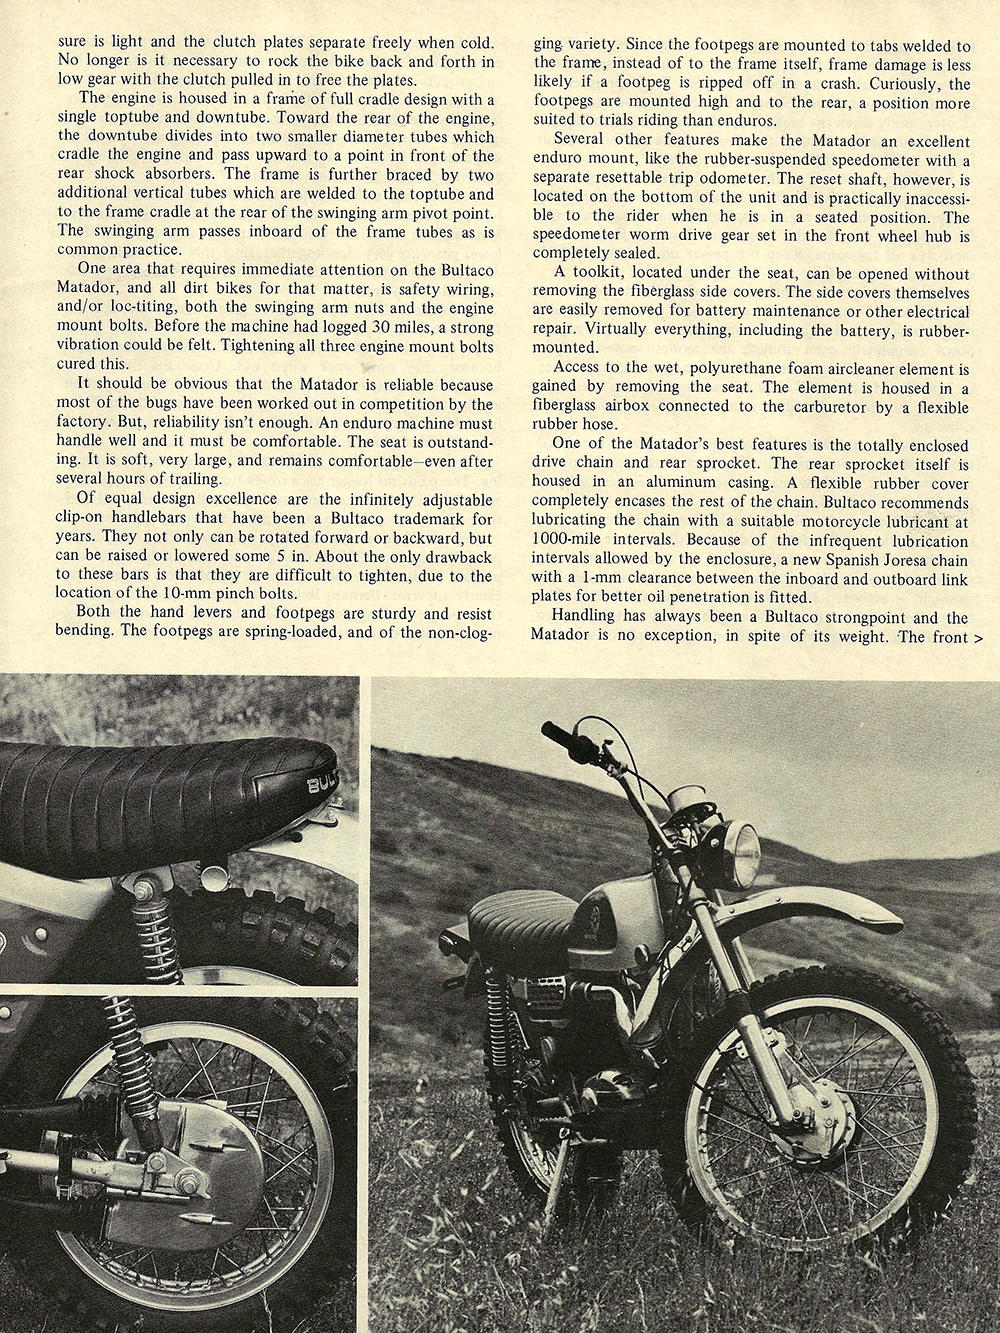 1971 Bultaco Matador 250 road test 02.jpg